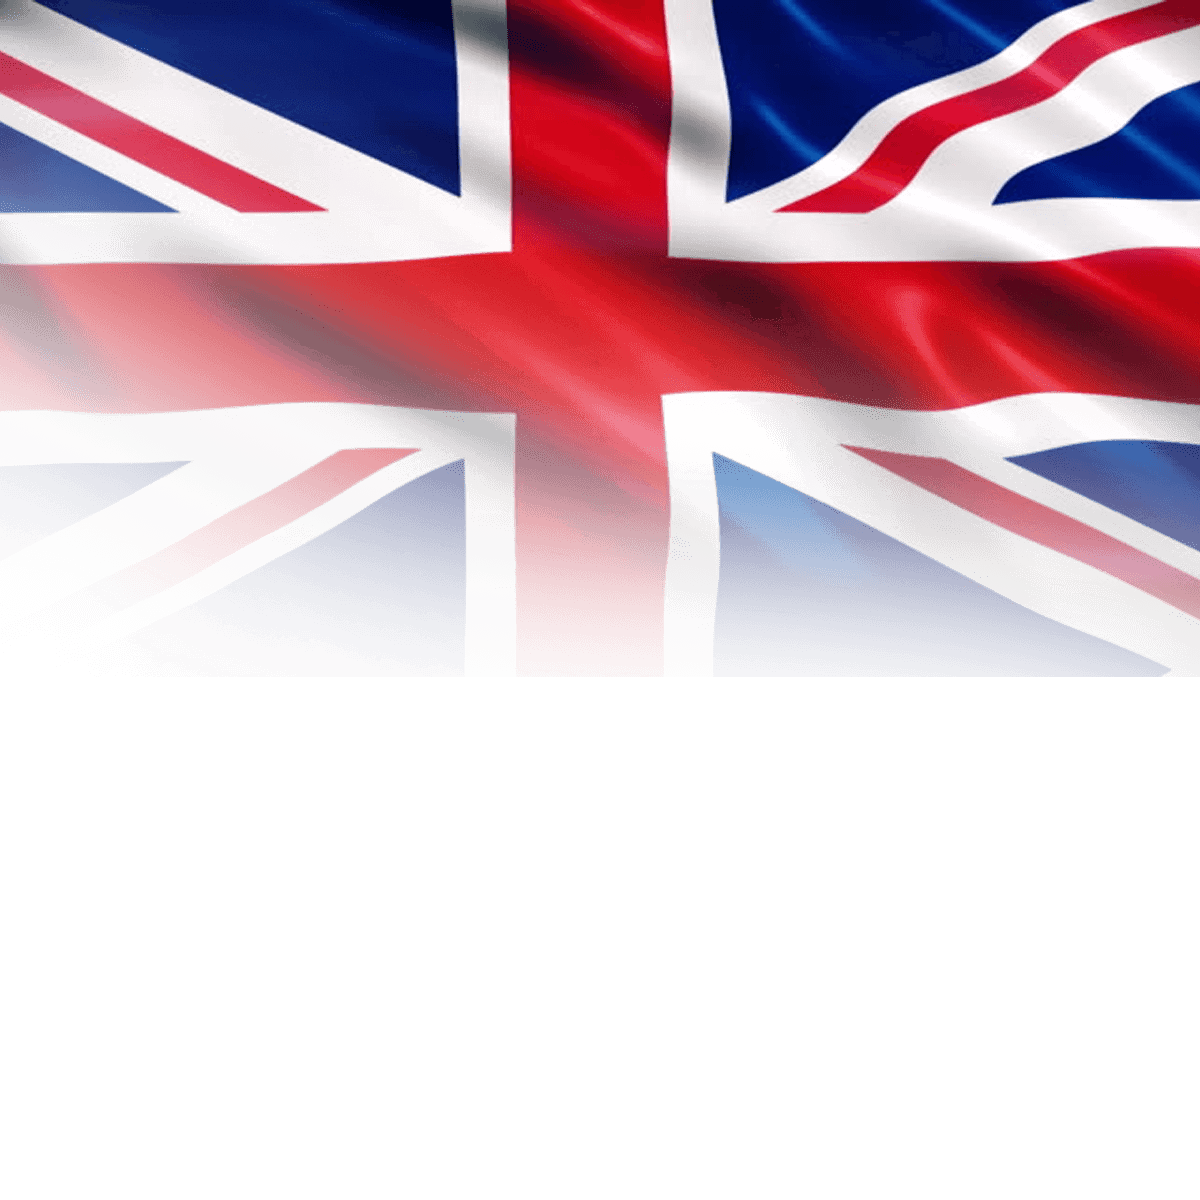 https://myscs.org/wp-content/uploads/2021/06/UK-Flag-Box.png